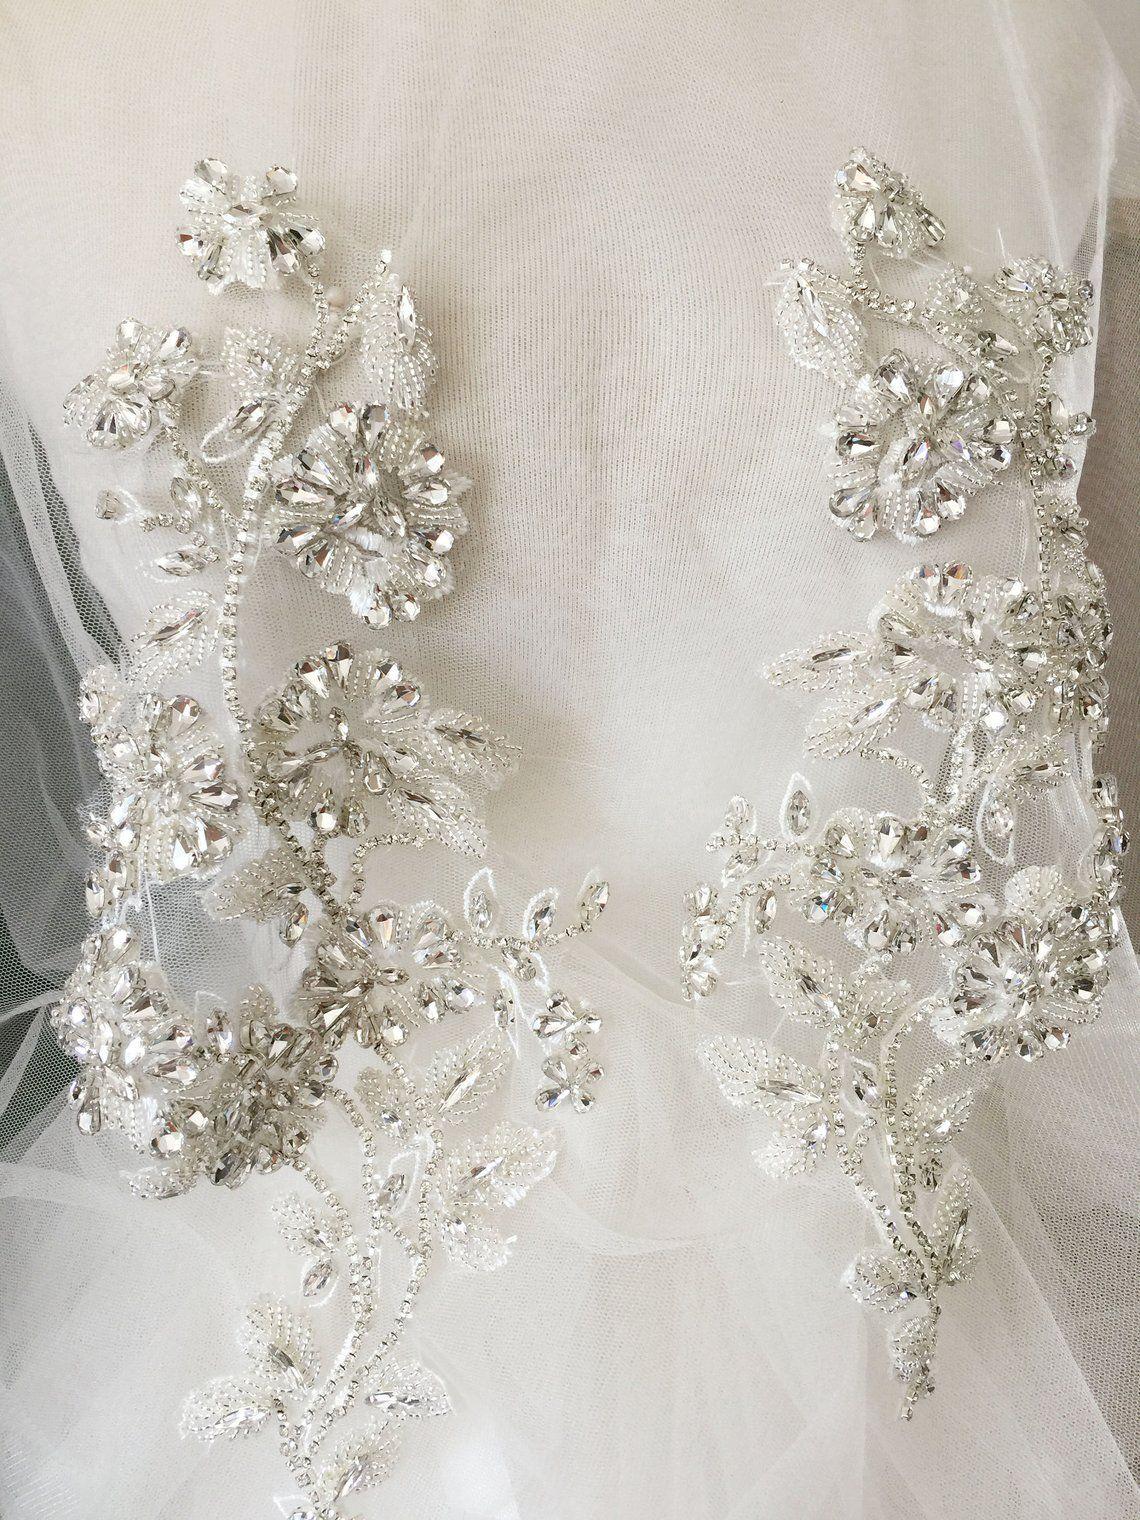 Luxury Rhinestone Crystal Beaded Lace Applique Pair Wedding Gown